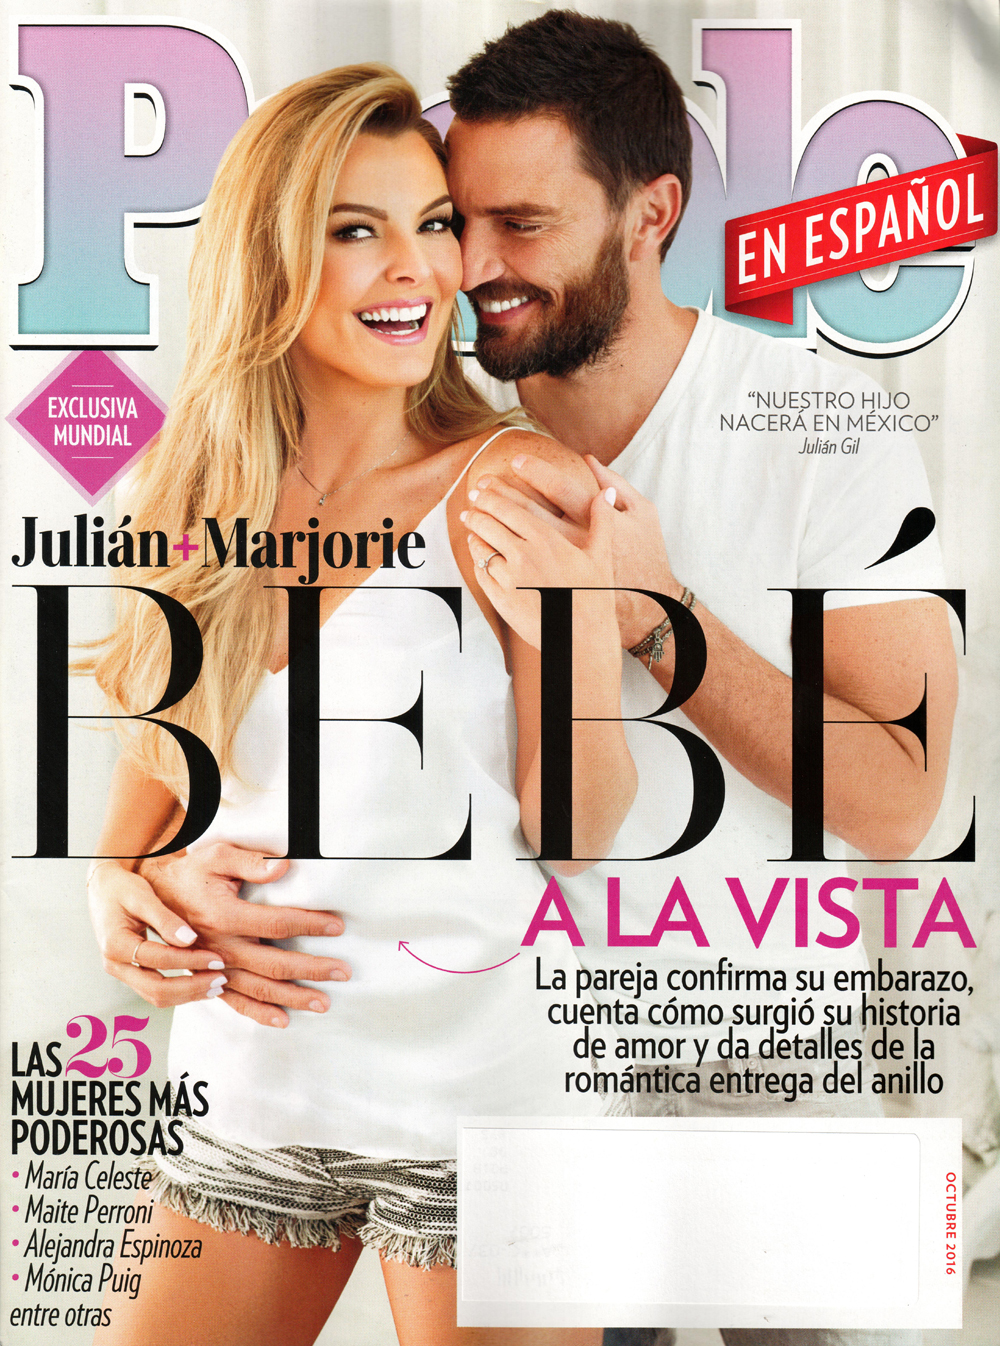 People En Espanol Cover Featuring art dept.